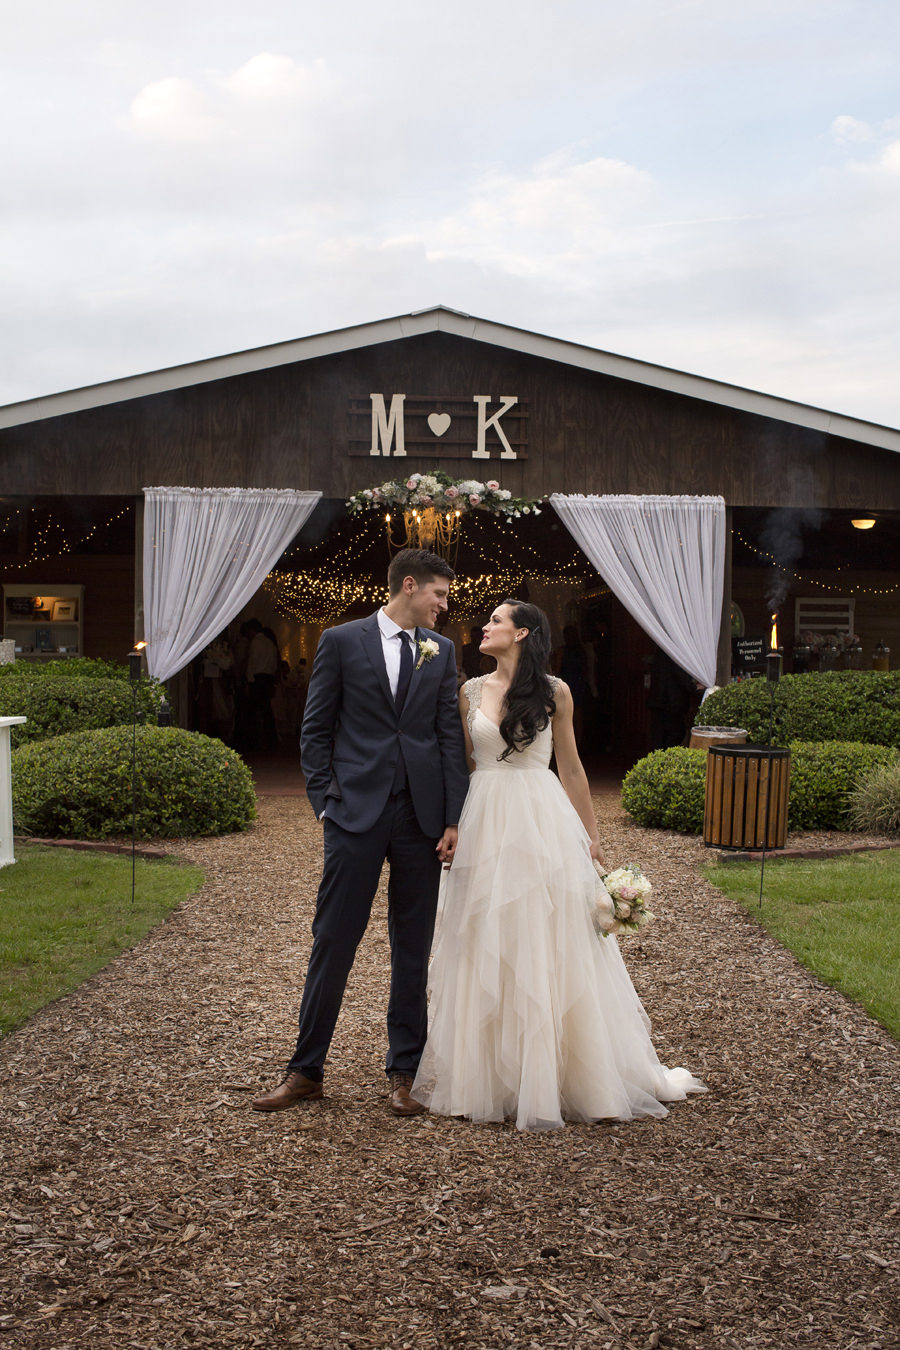 Outdoor Bride and Groom Wedding Portrait in Front of Barn | Tampa Bay Wedding Venue Cross Creek Ranch | Wedding Photographer Djamel Photography